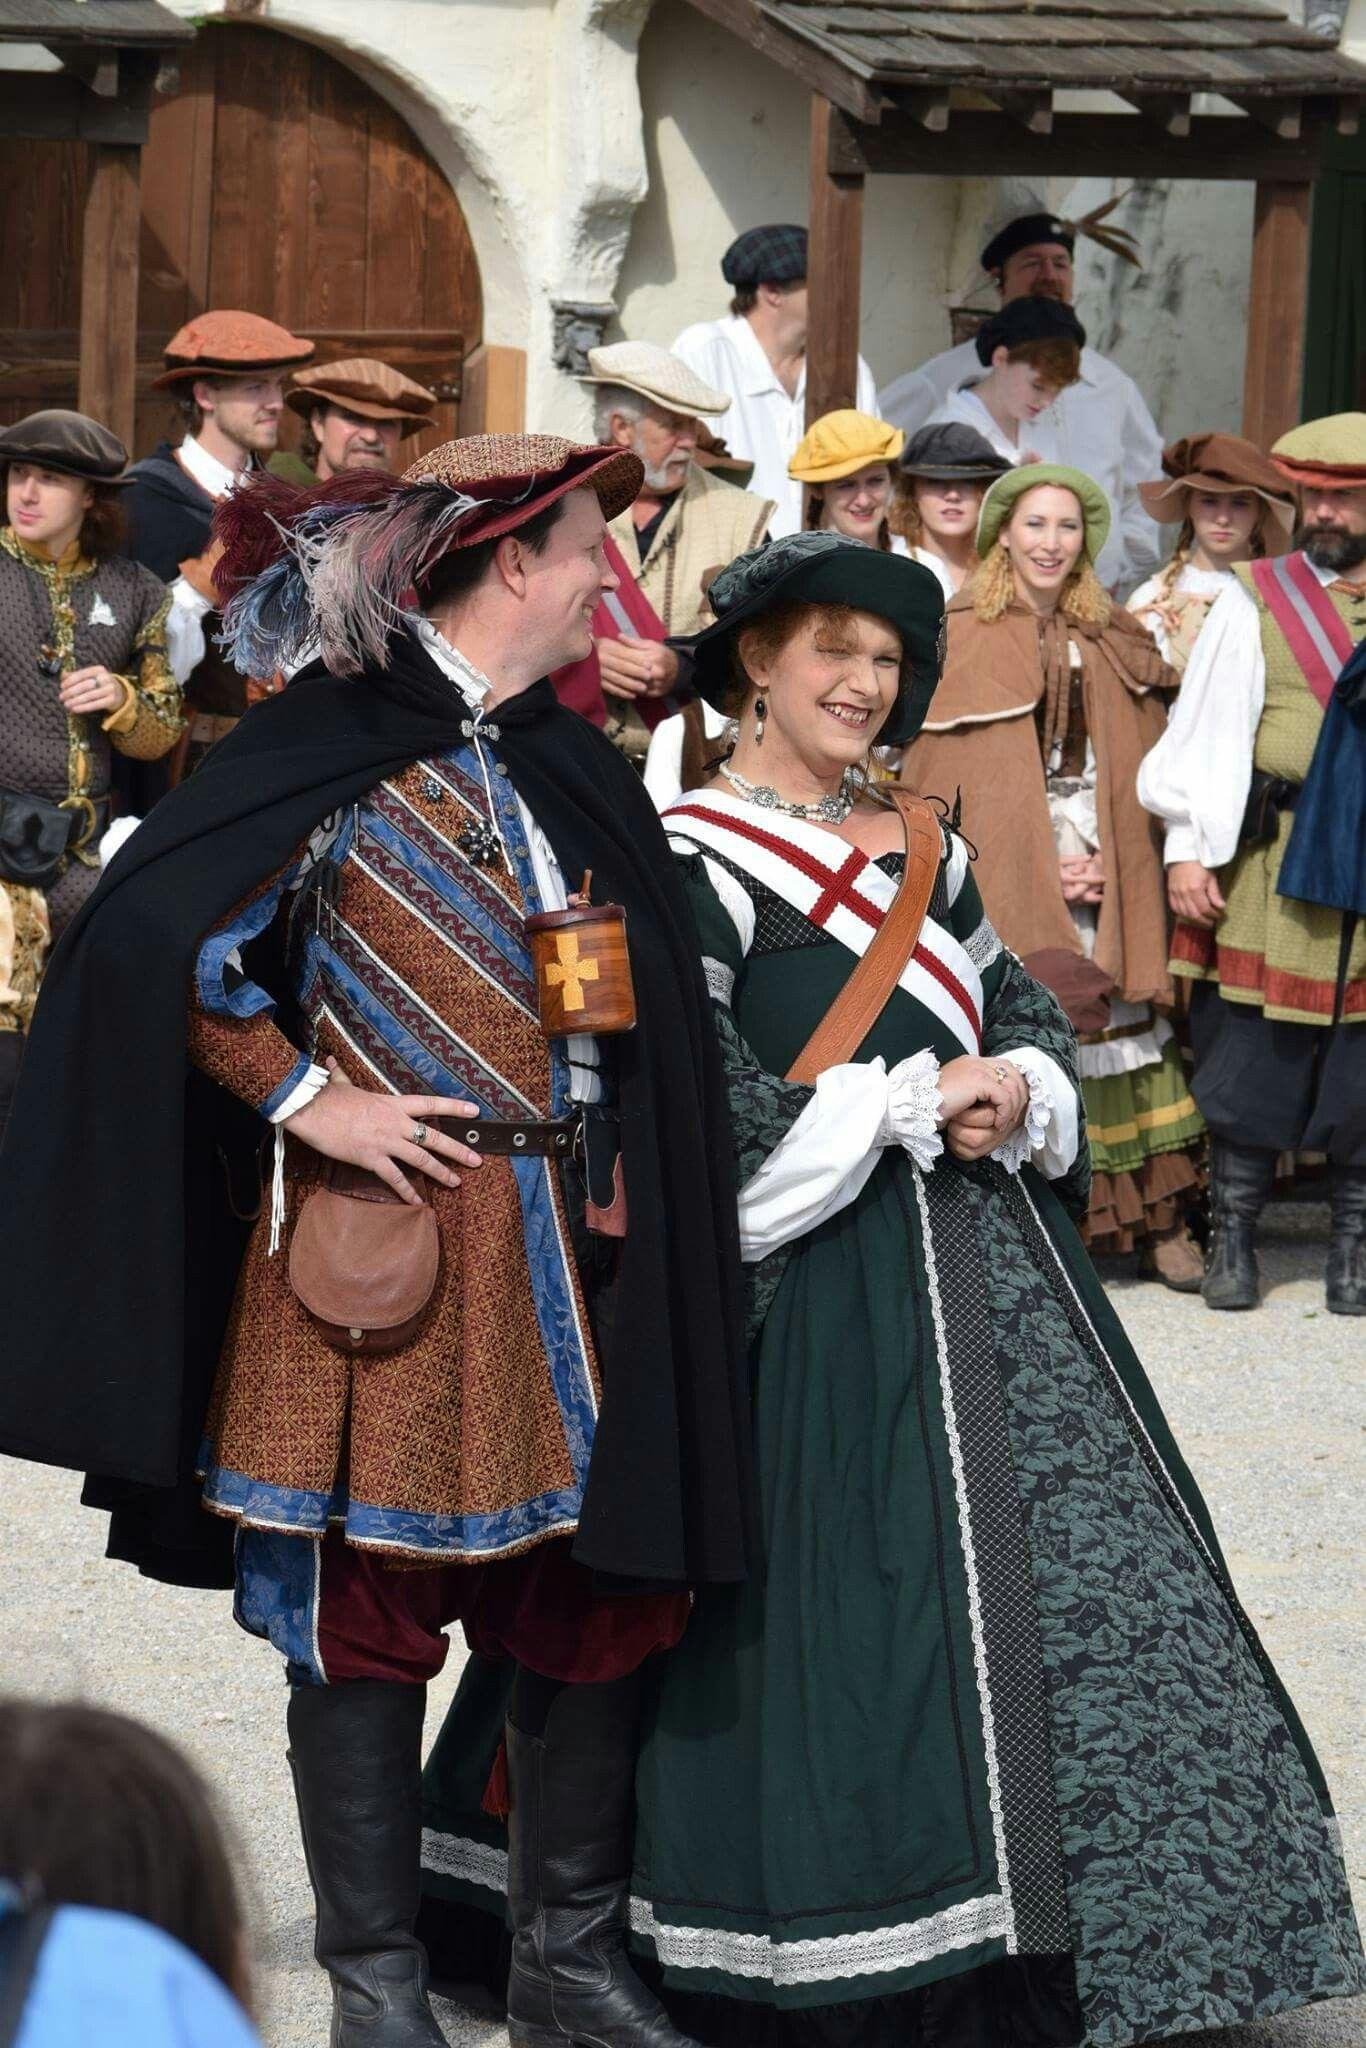 Scarborough Fair Tx Men's costume Renaissance fair